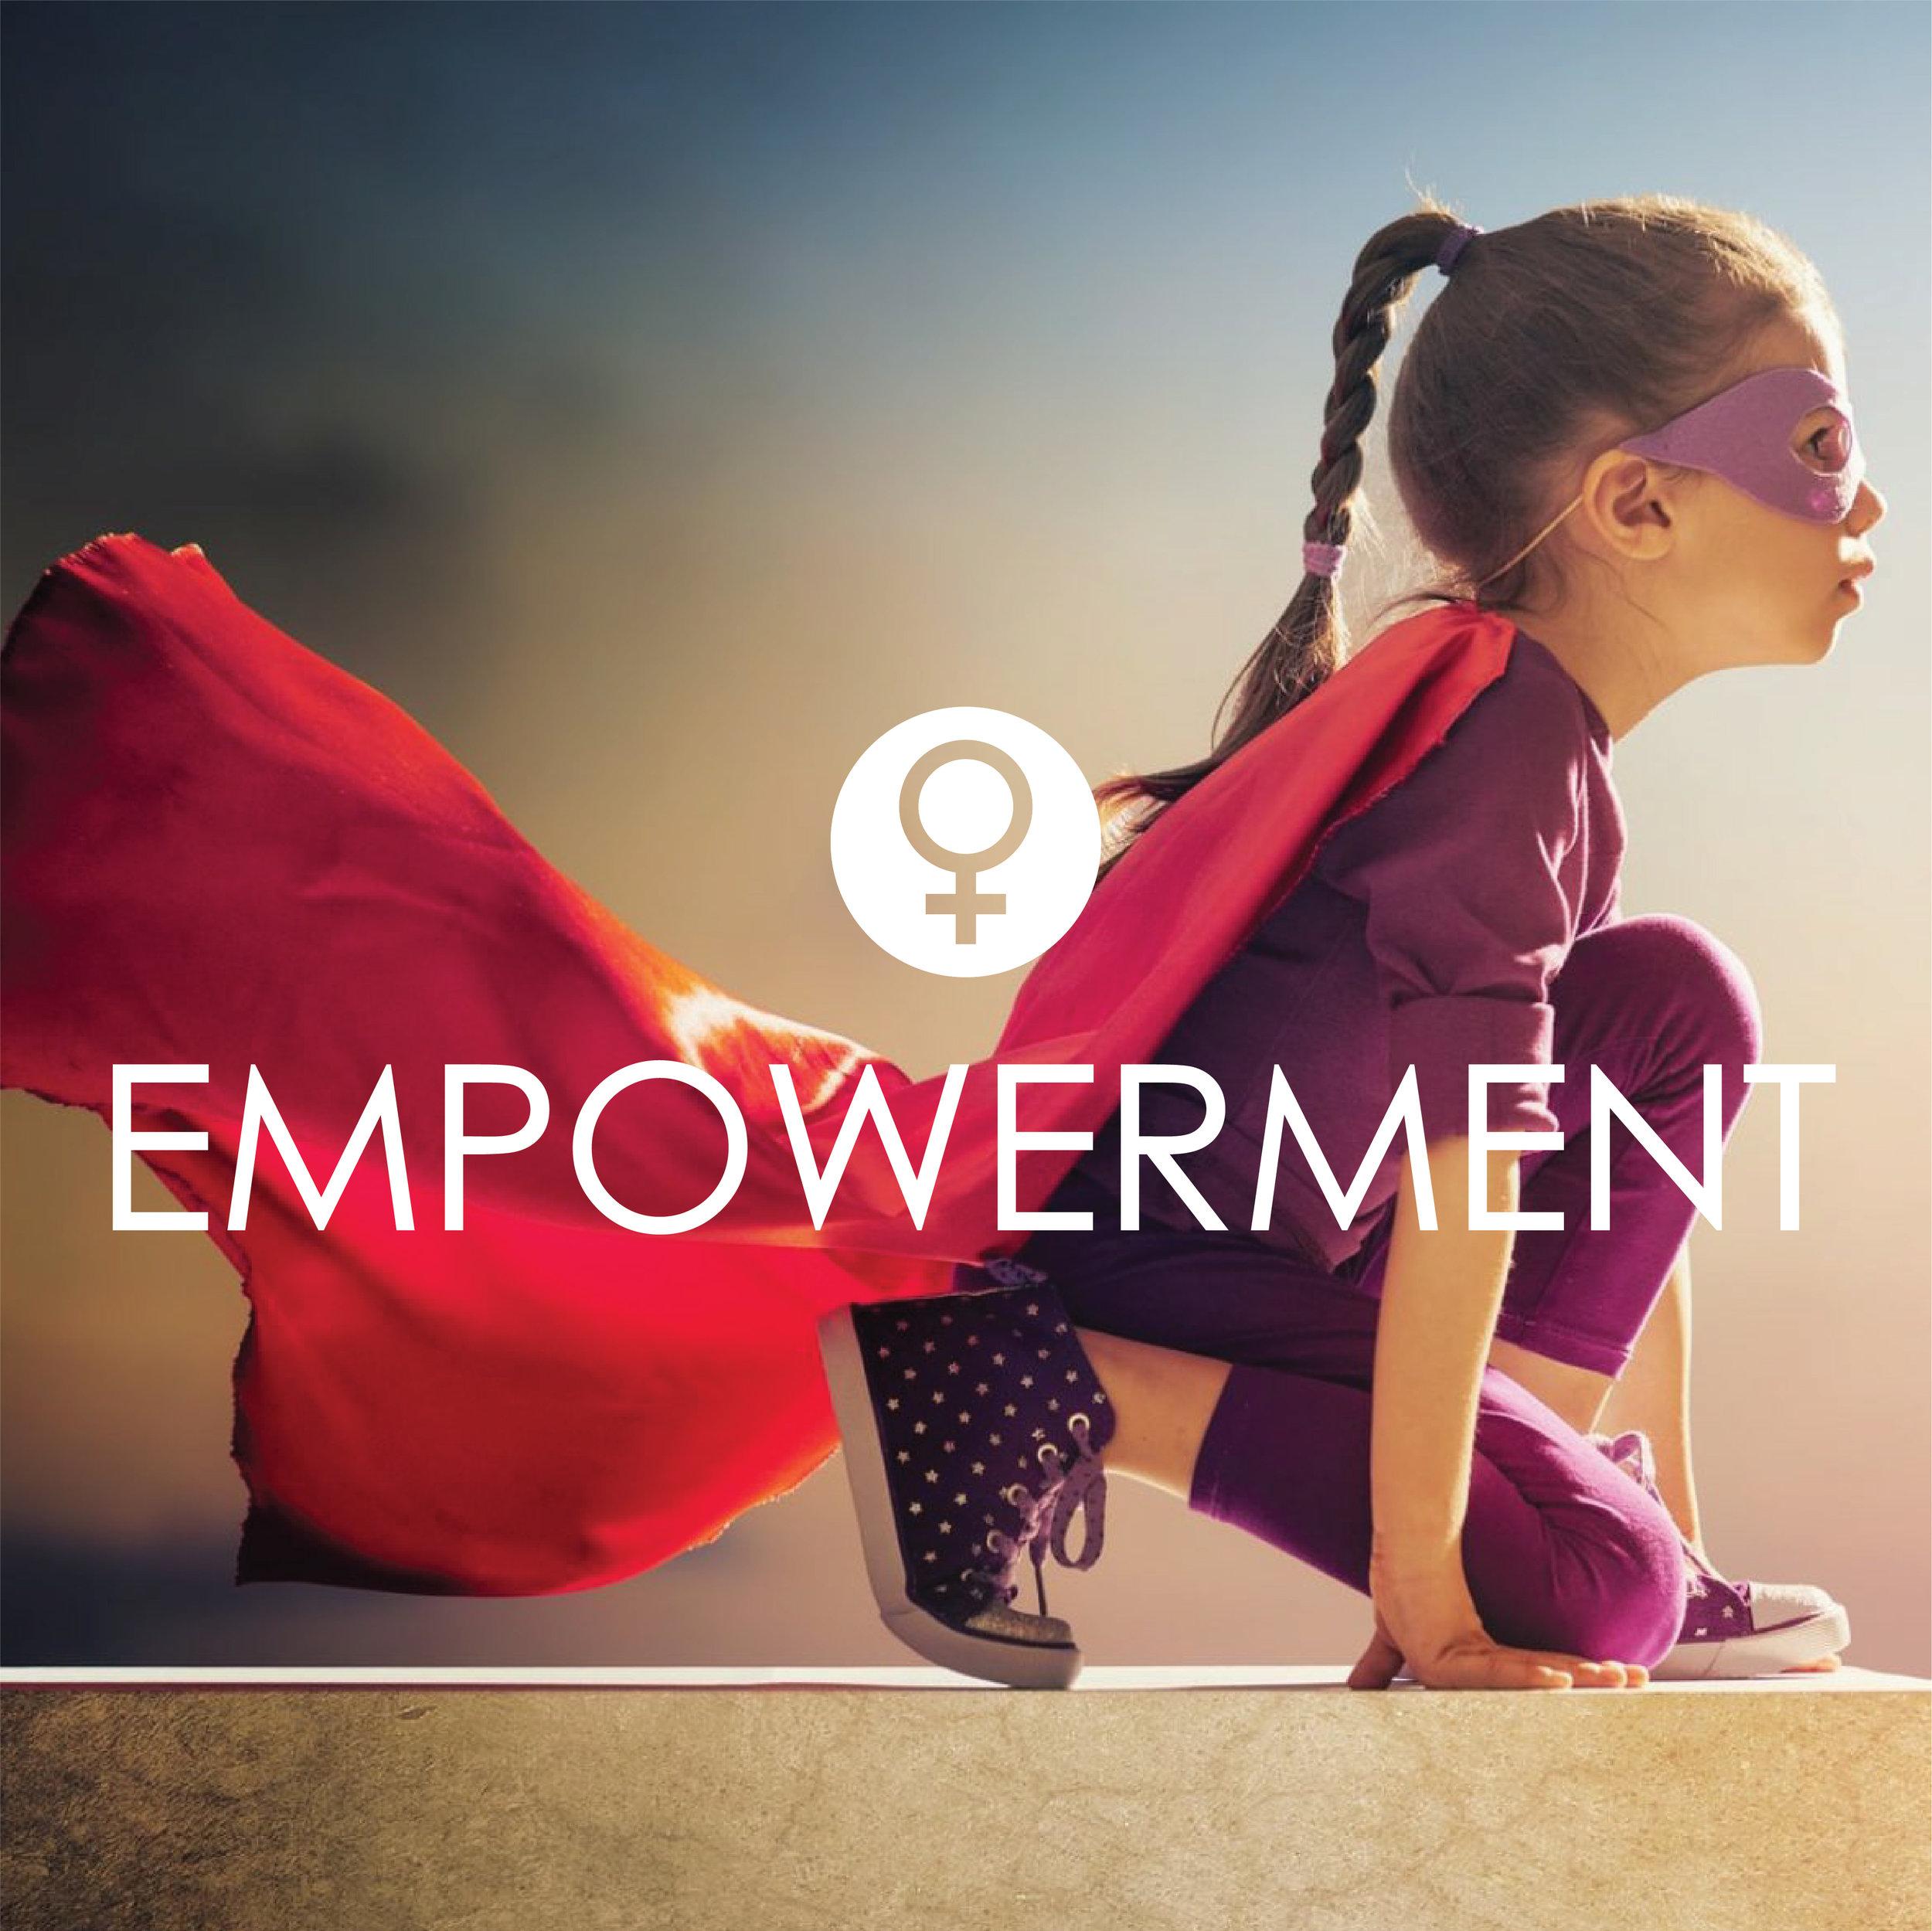 portada empowerment-04.jpg